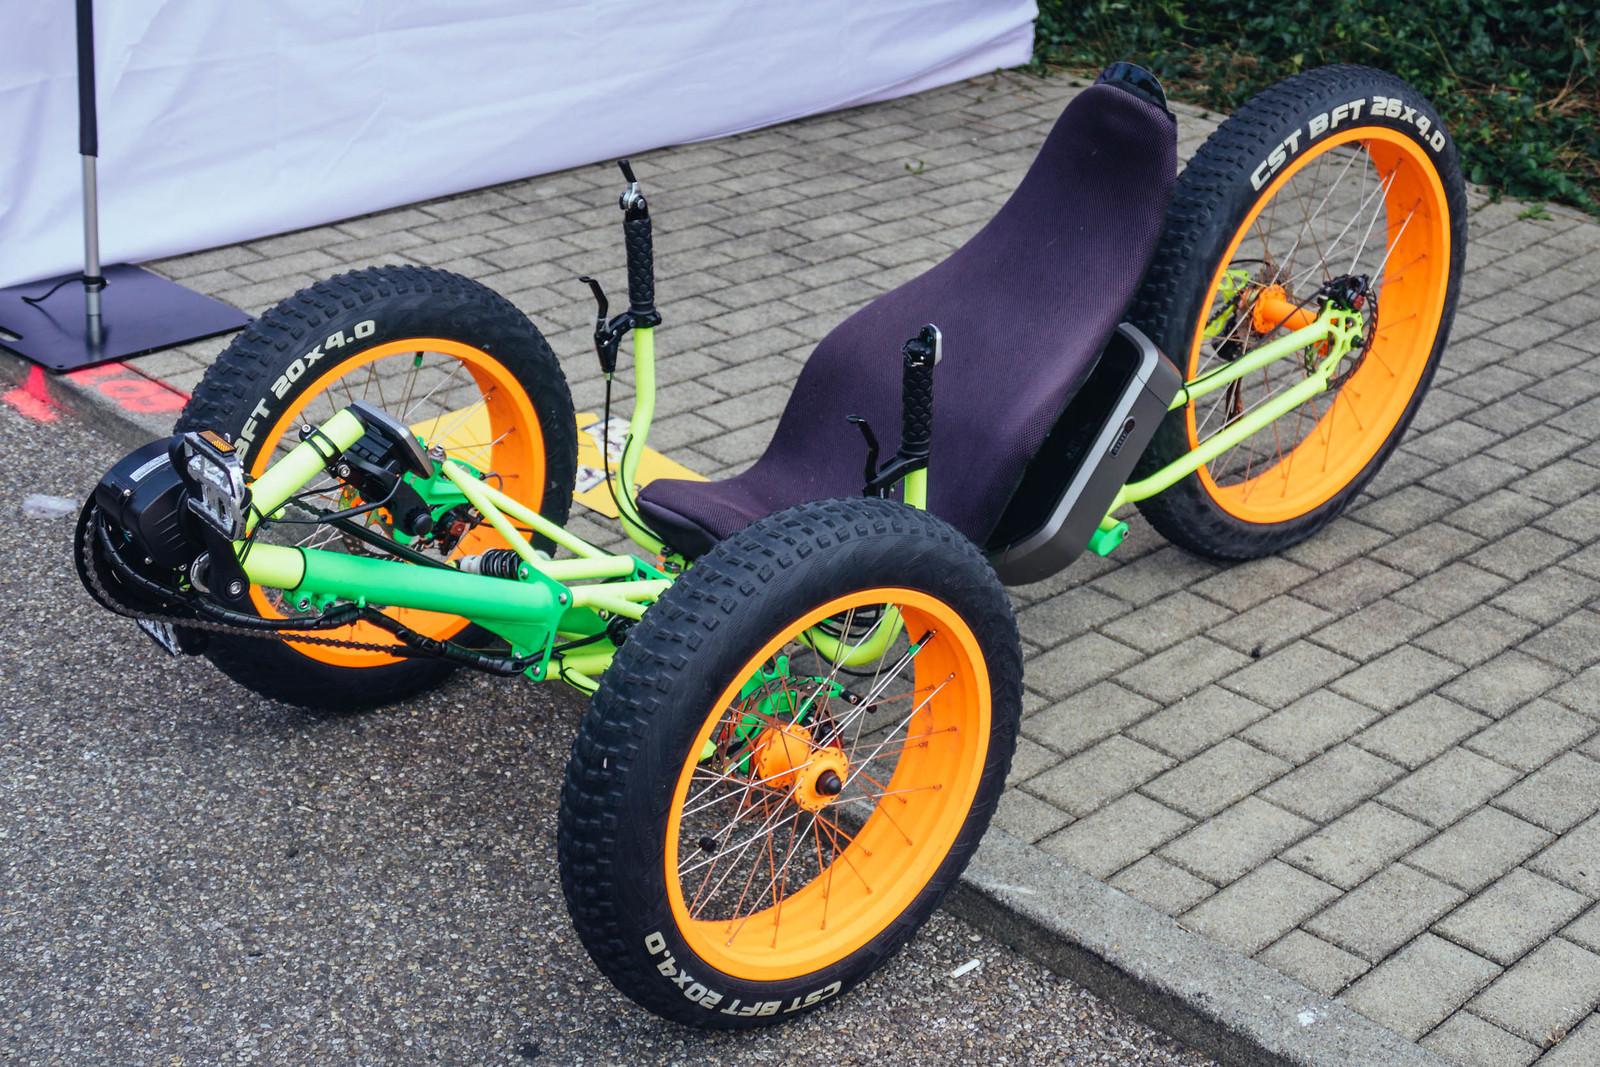 Three Wheel Thunder - iceman2058 - Mountain Biking Pictures - Vital MTB